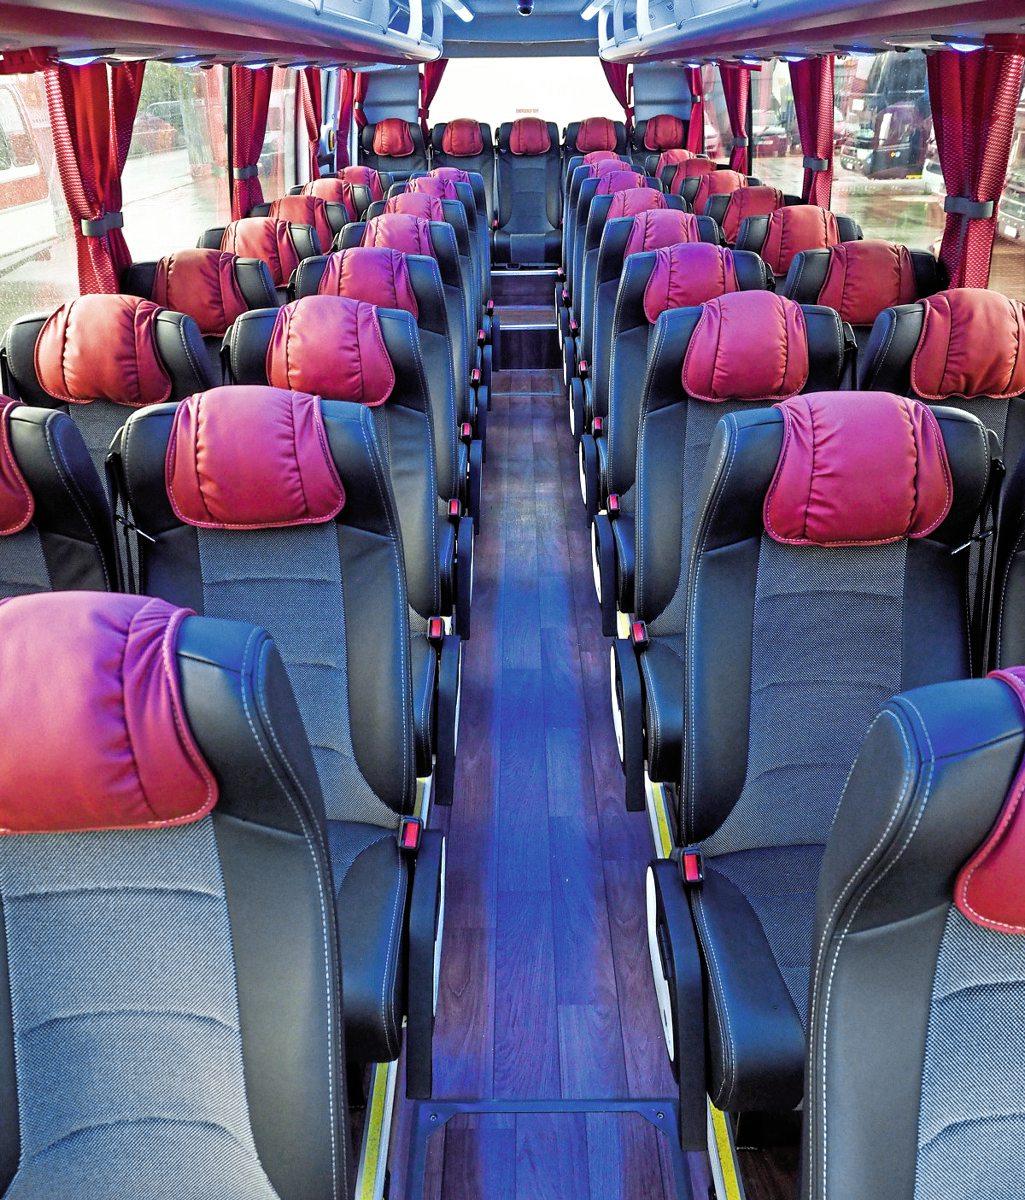 Nice passenger environment